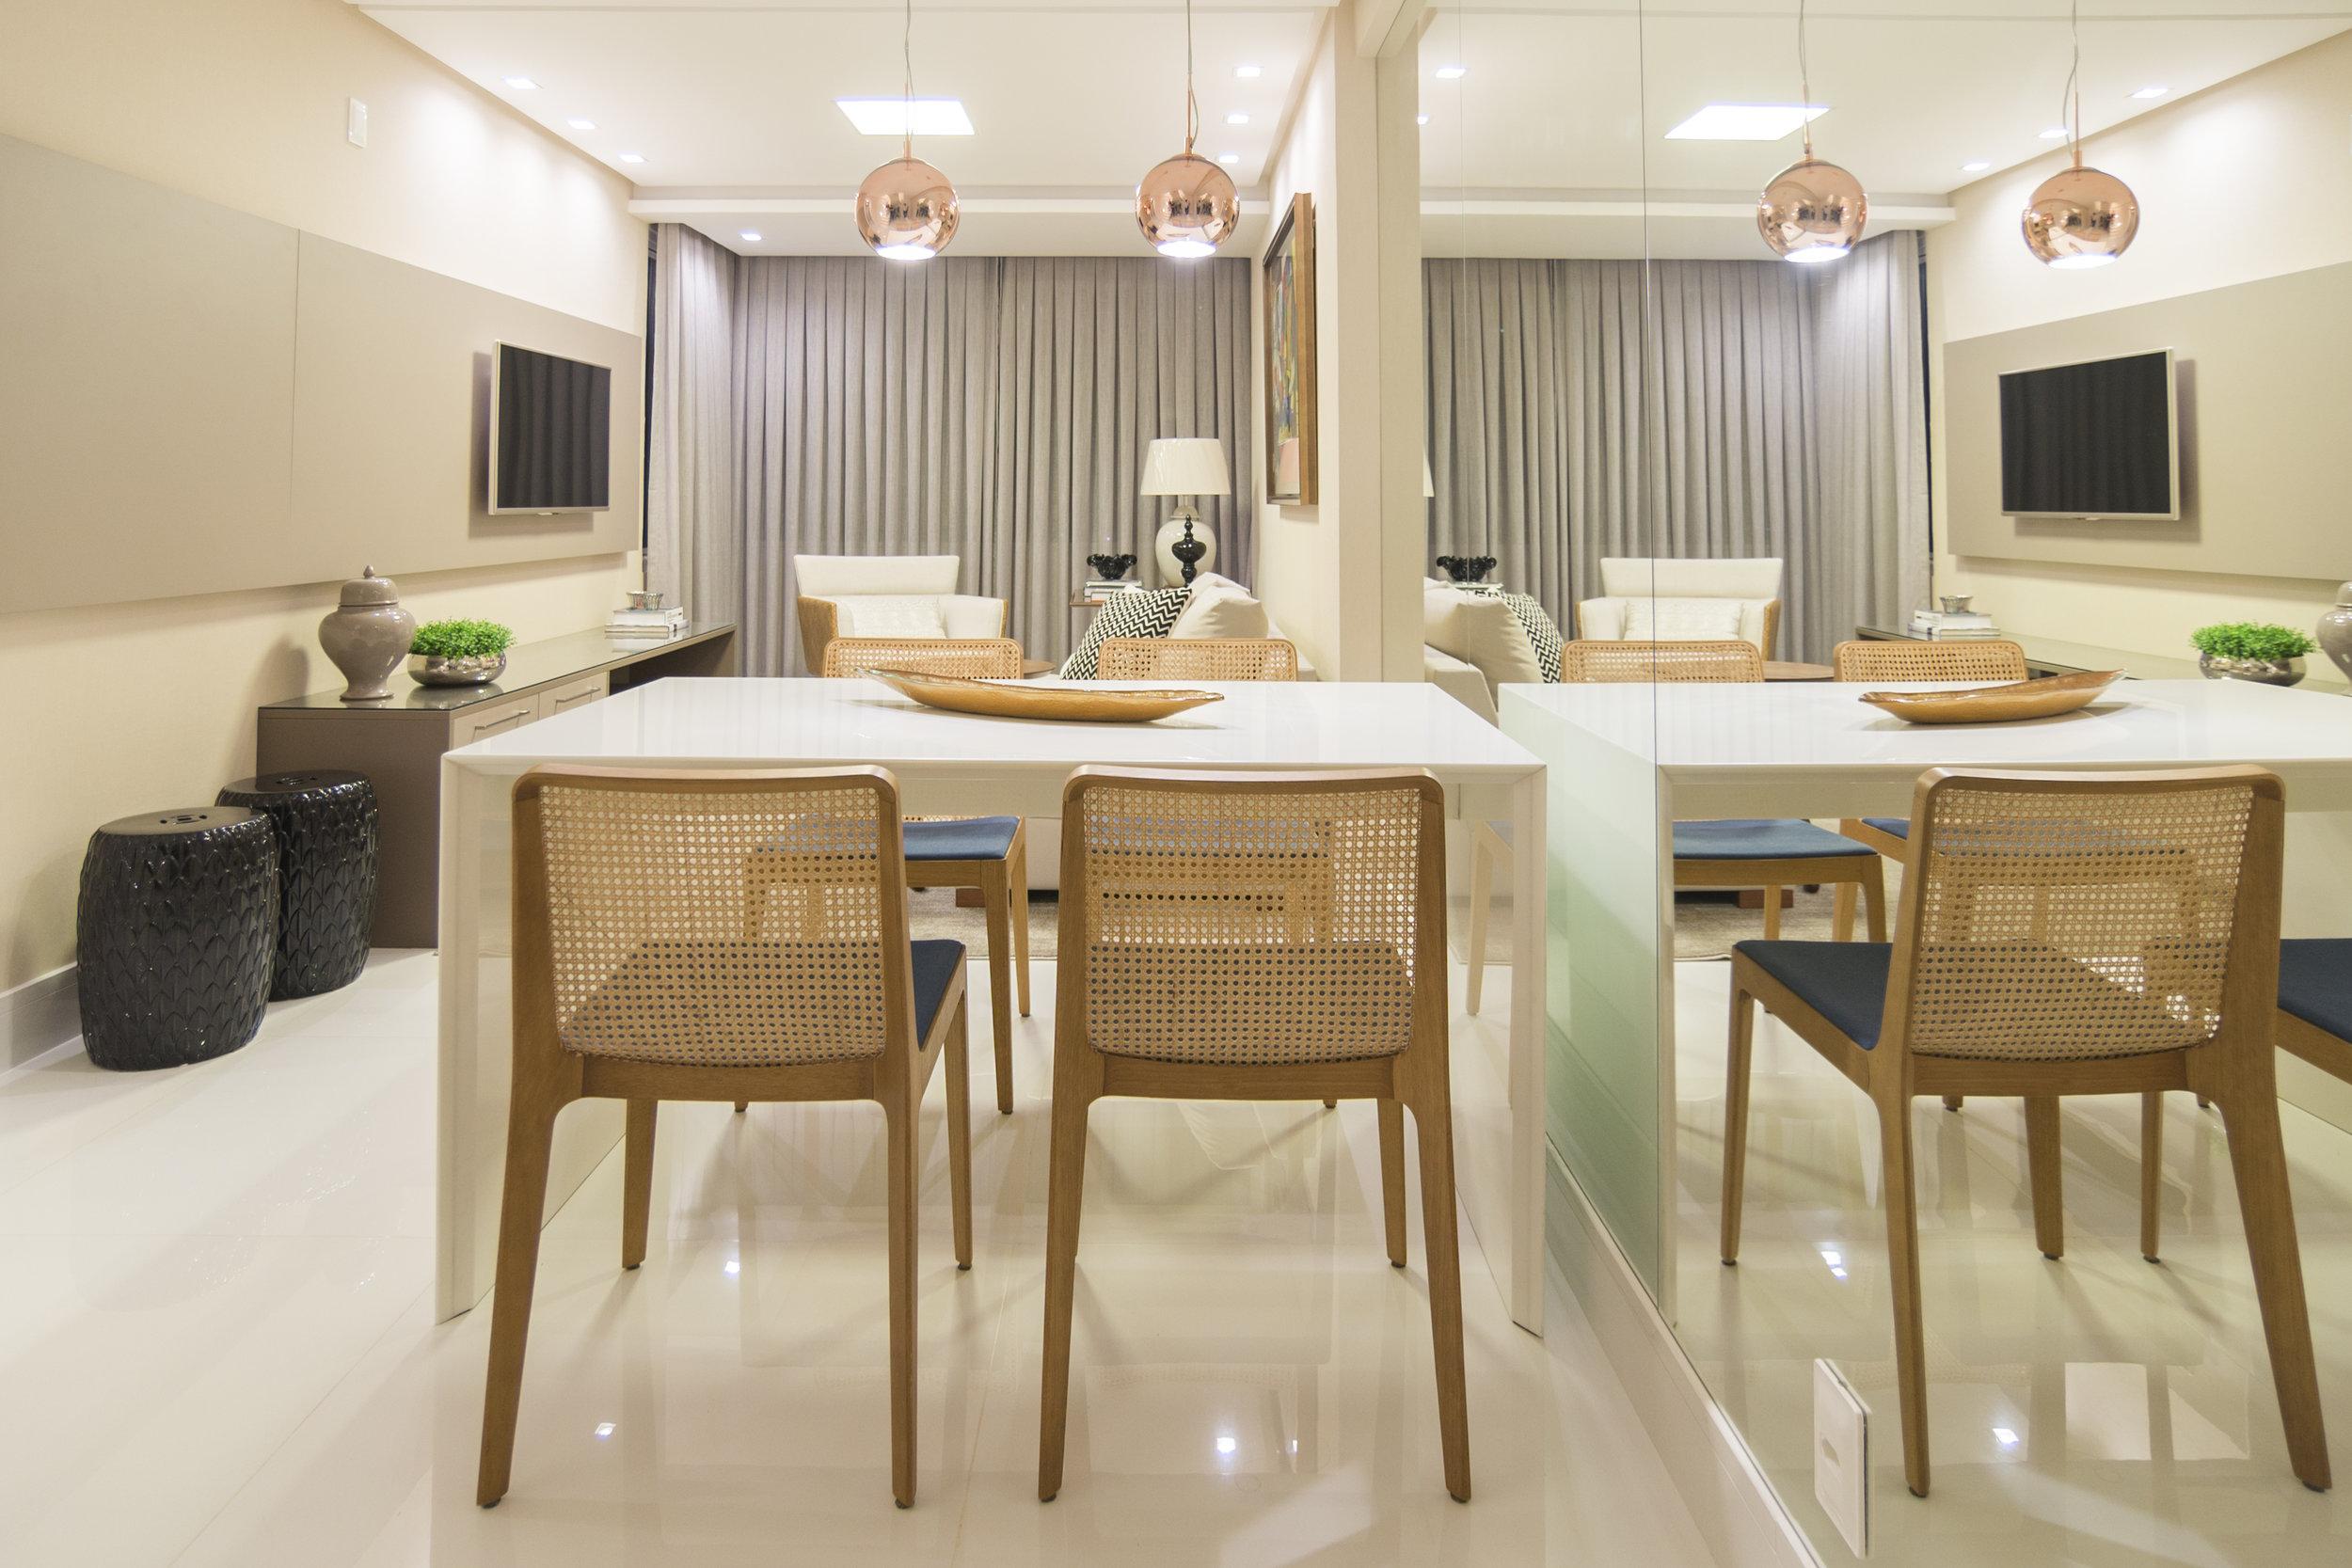 projeto-arquitetonico-robertoindira-duo-arquitetura-apartamentos-estar-01.jpg